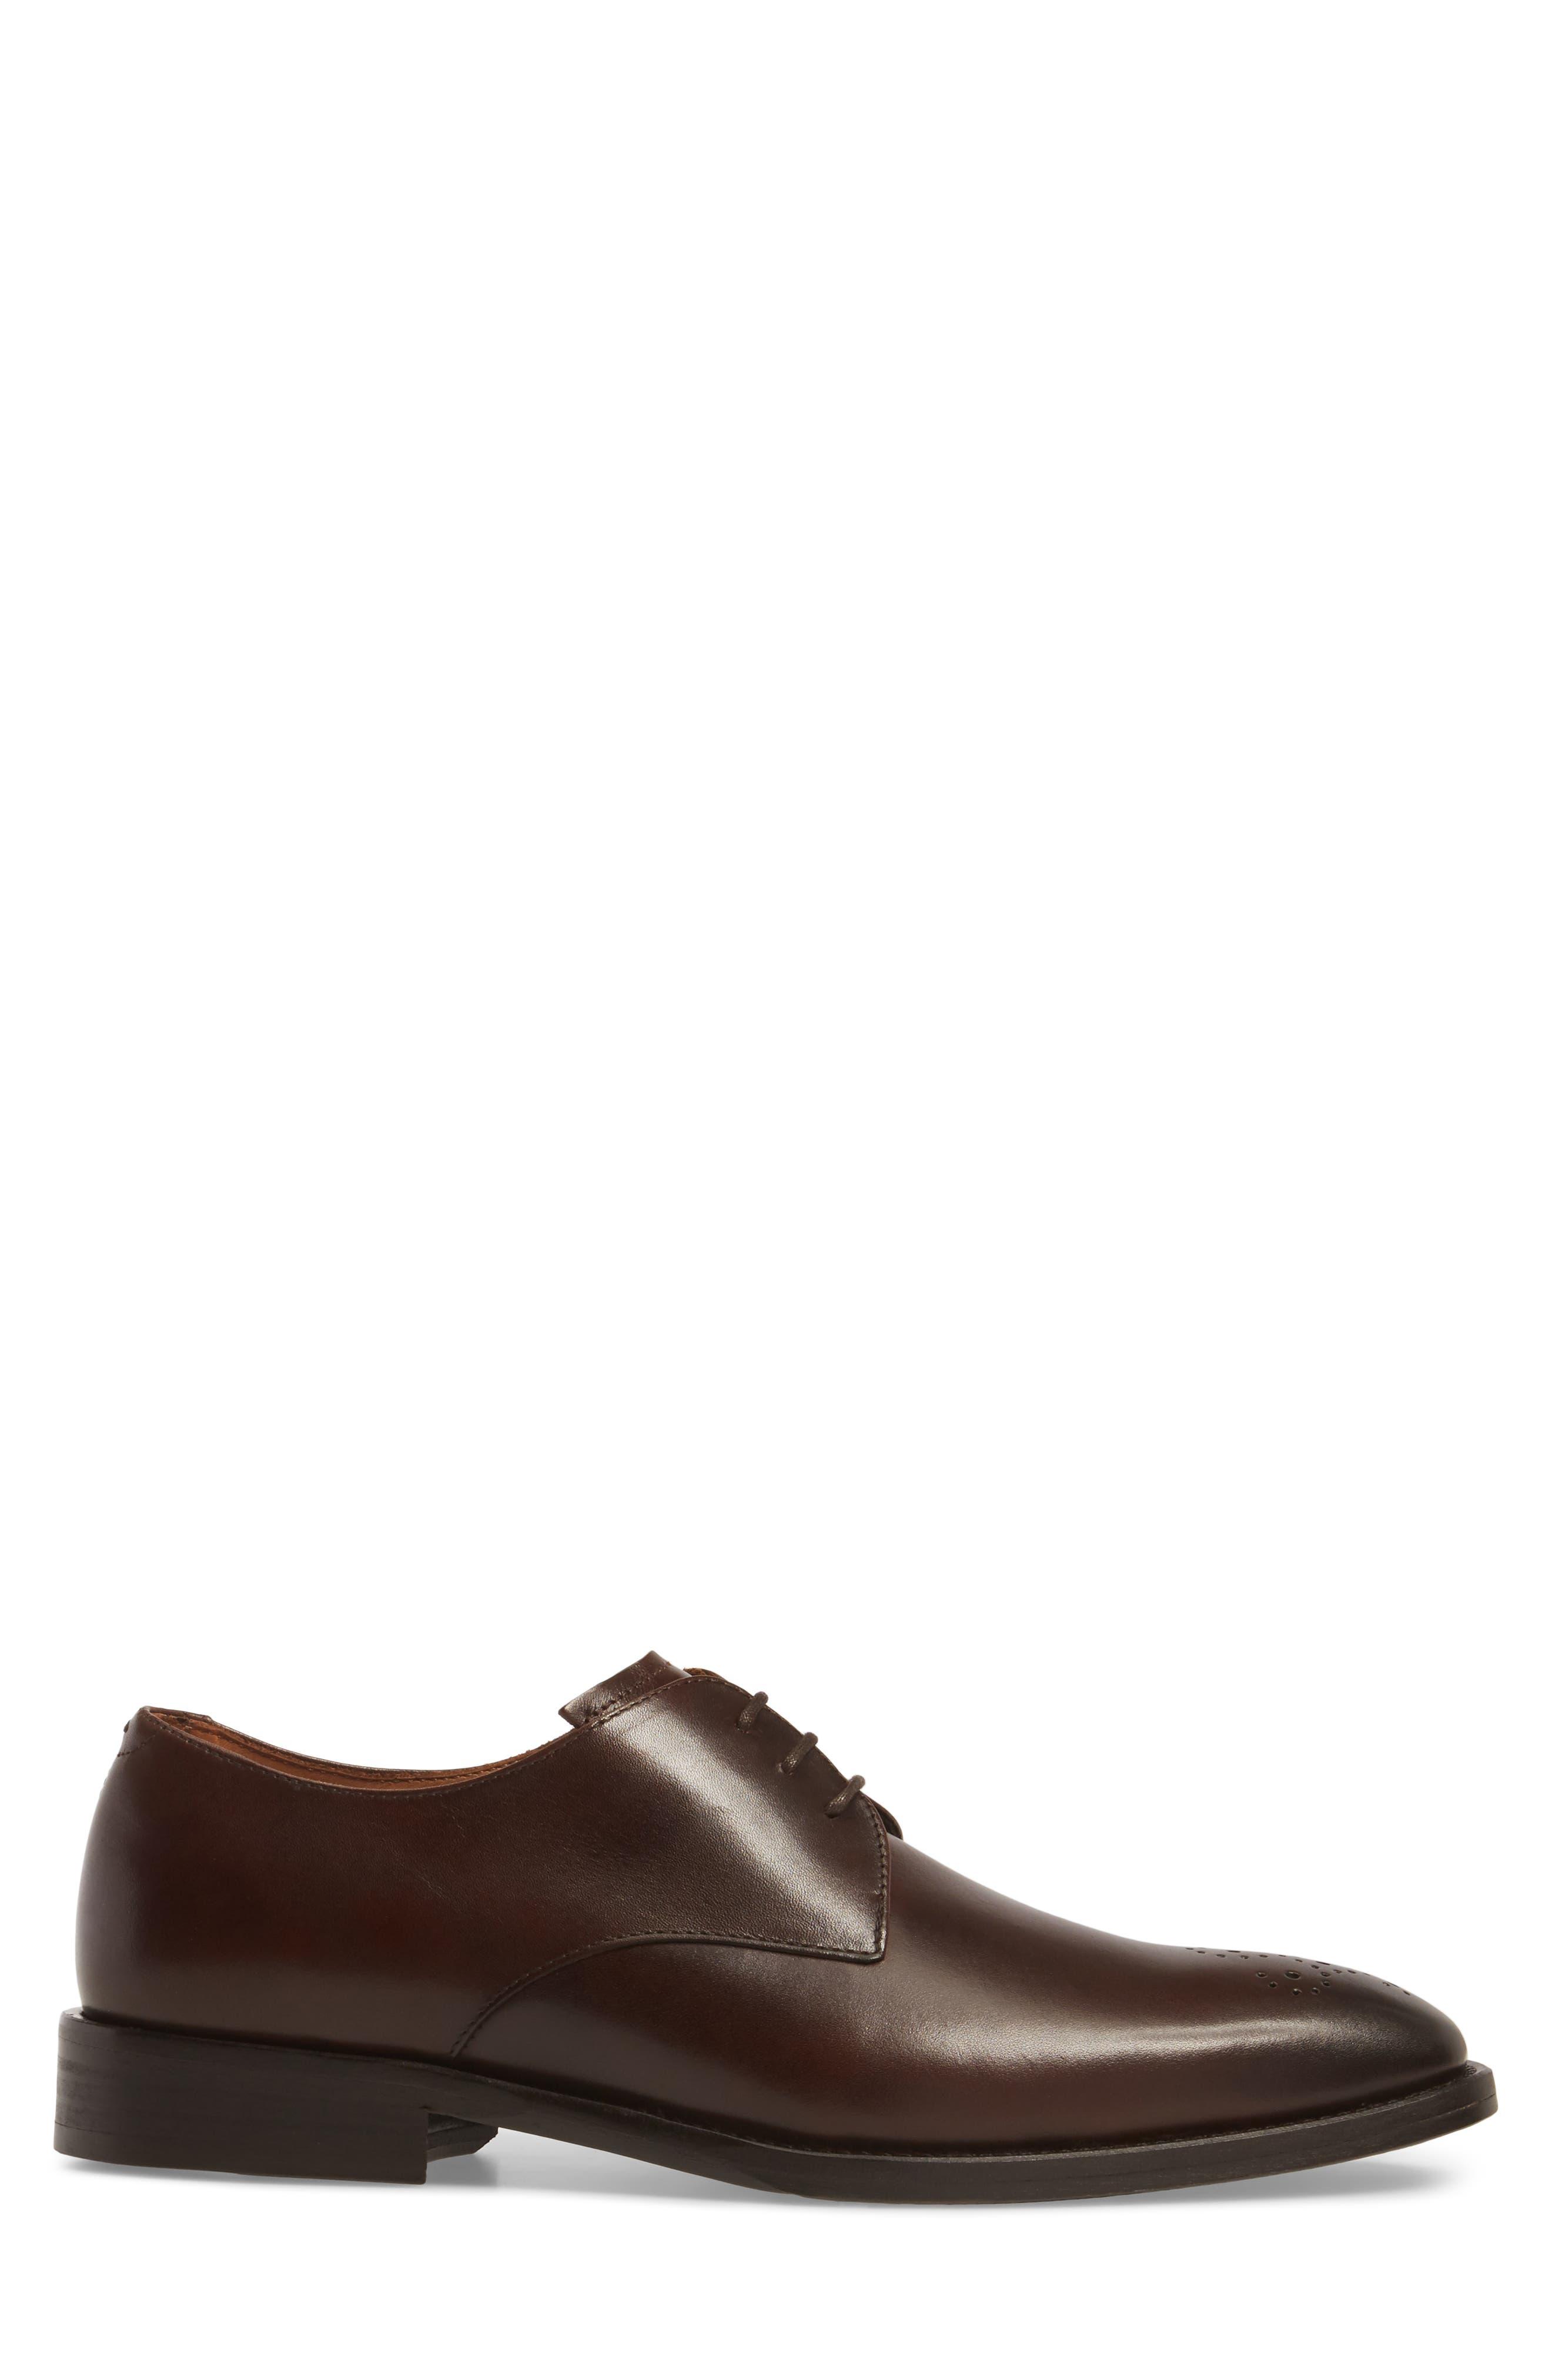 Haltter Medallion Toe Derby,                             Alternate thumbnail 3, color,                             Dark Brown Leather